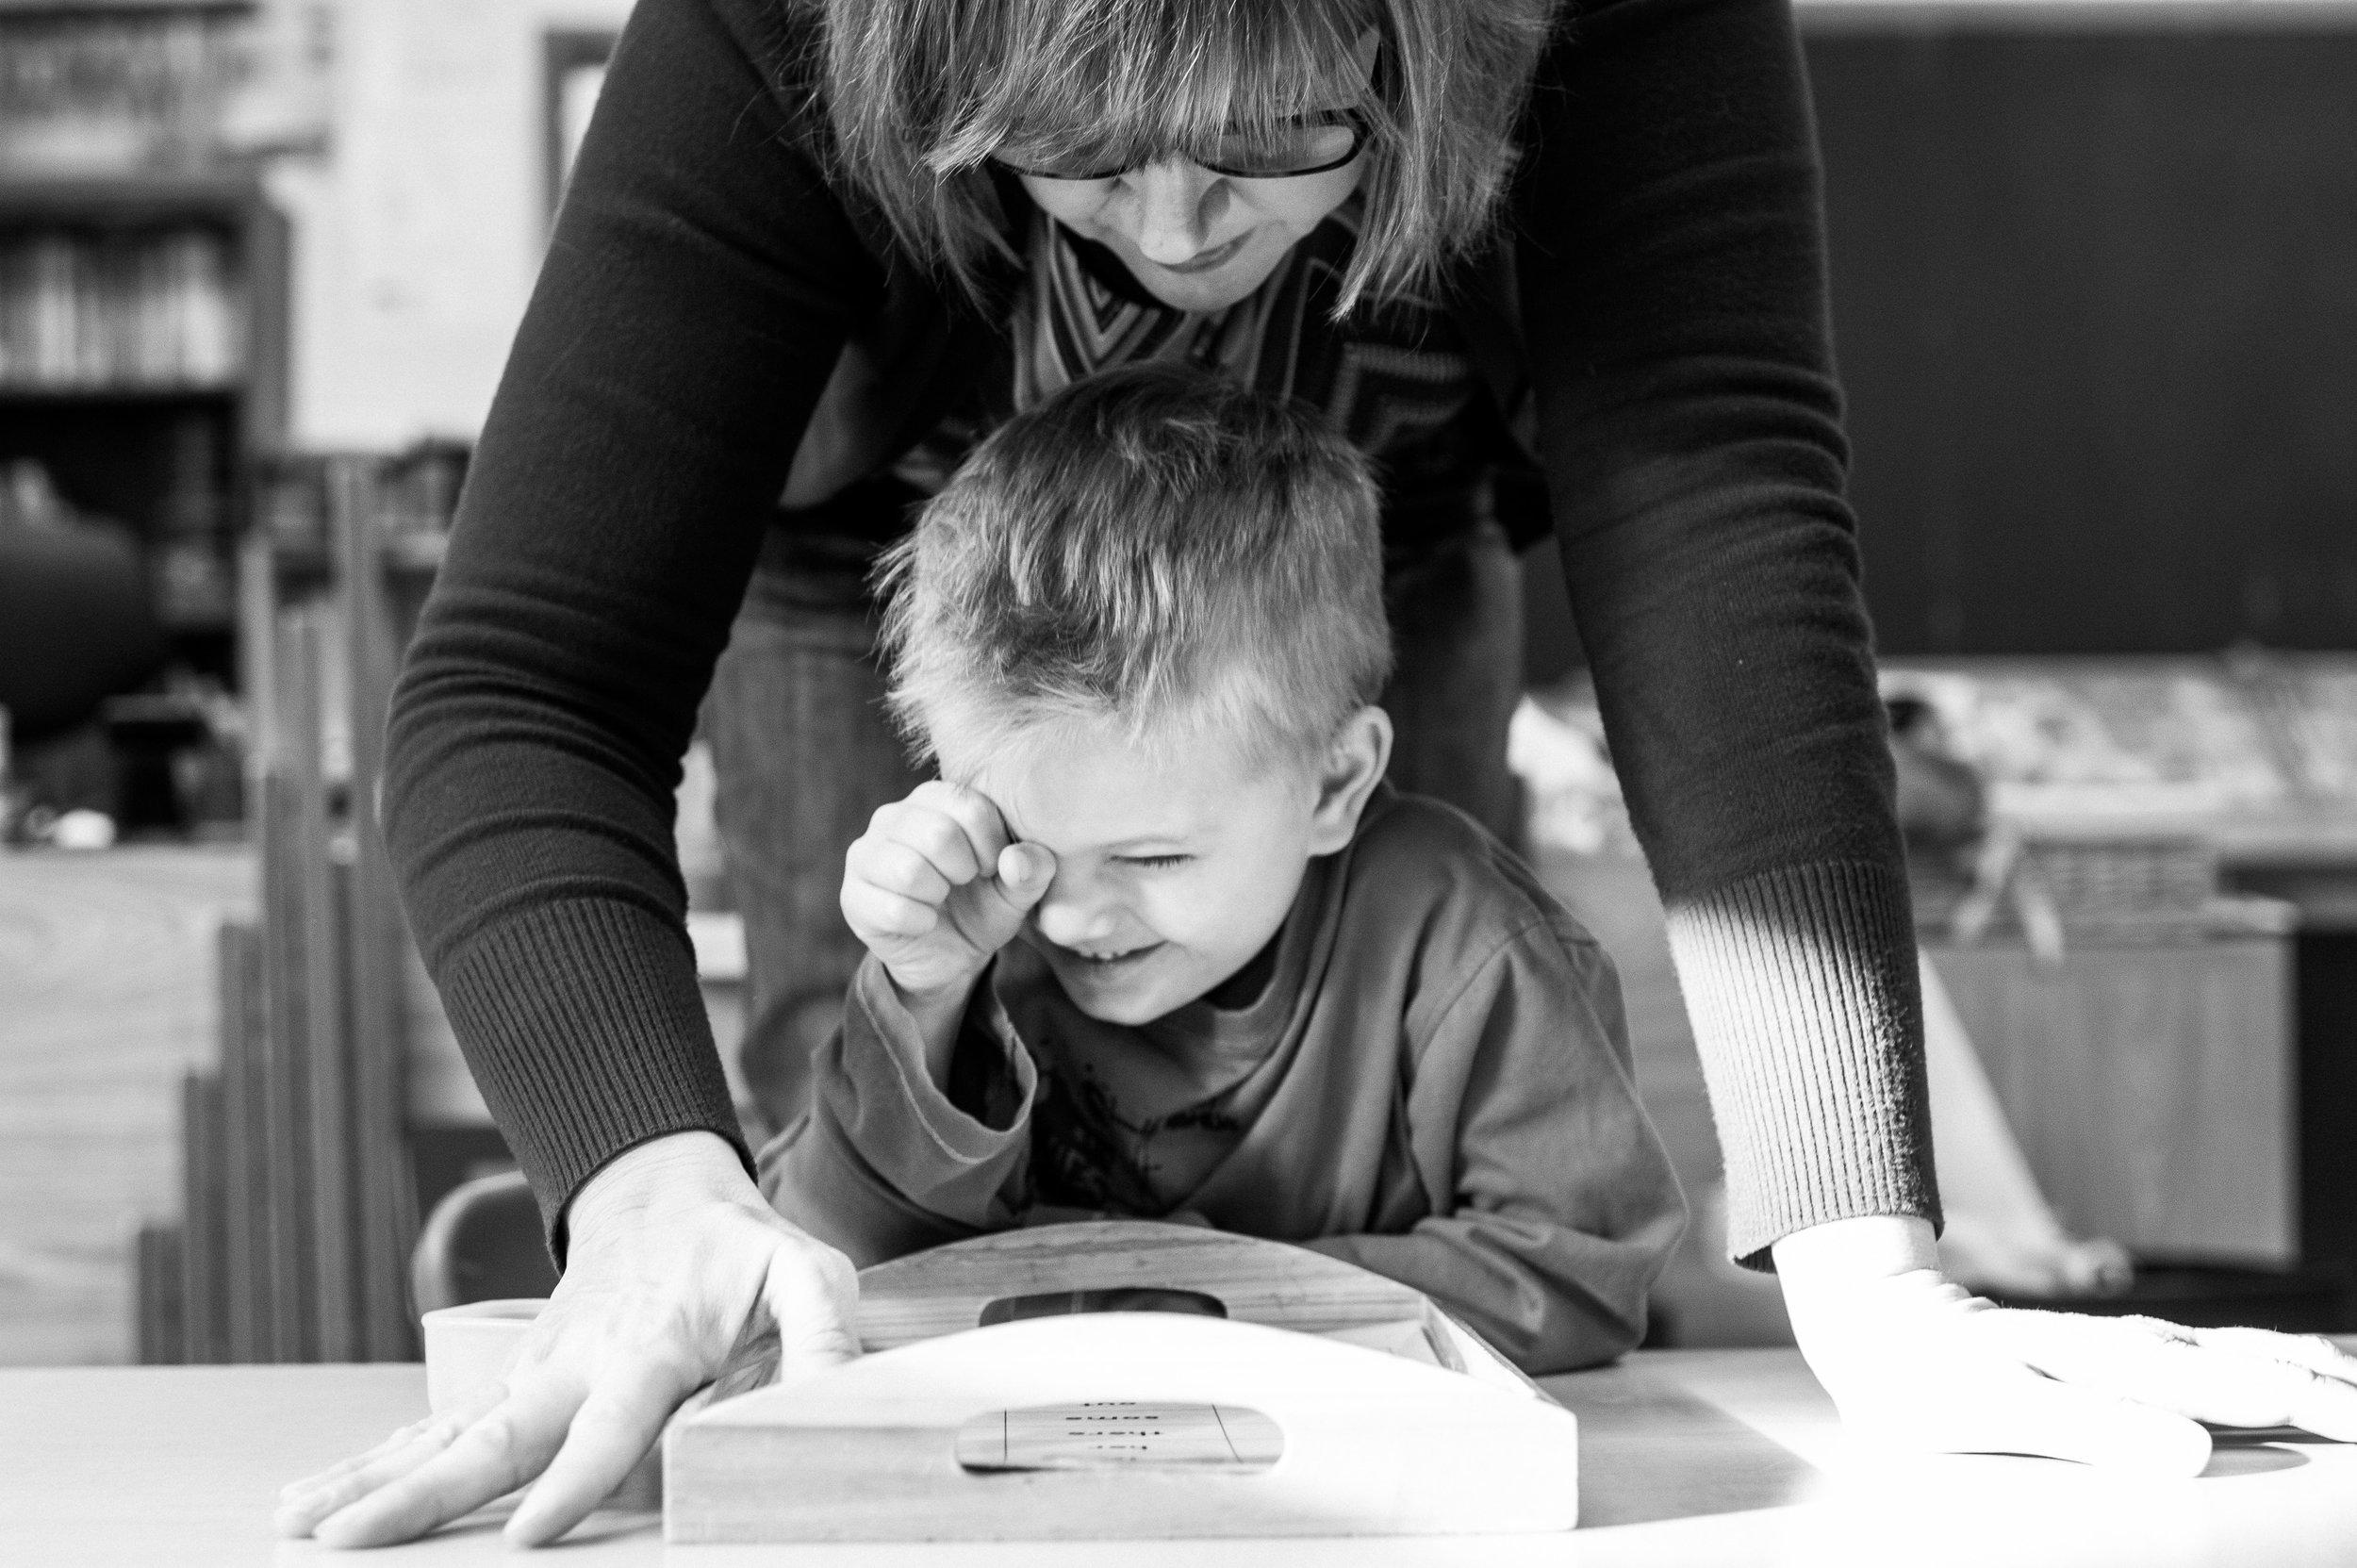 documentary school photography viara mileva kingston toronto ottawa-165422vm.jpg